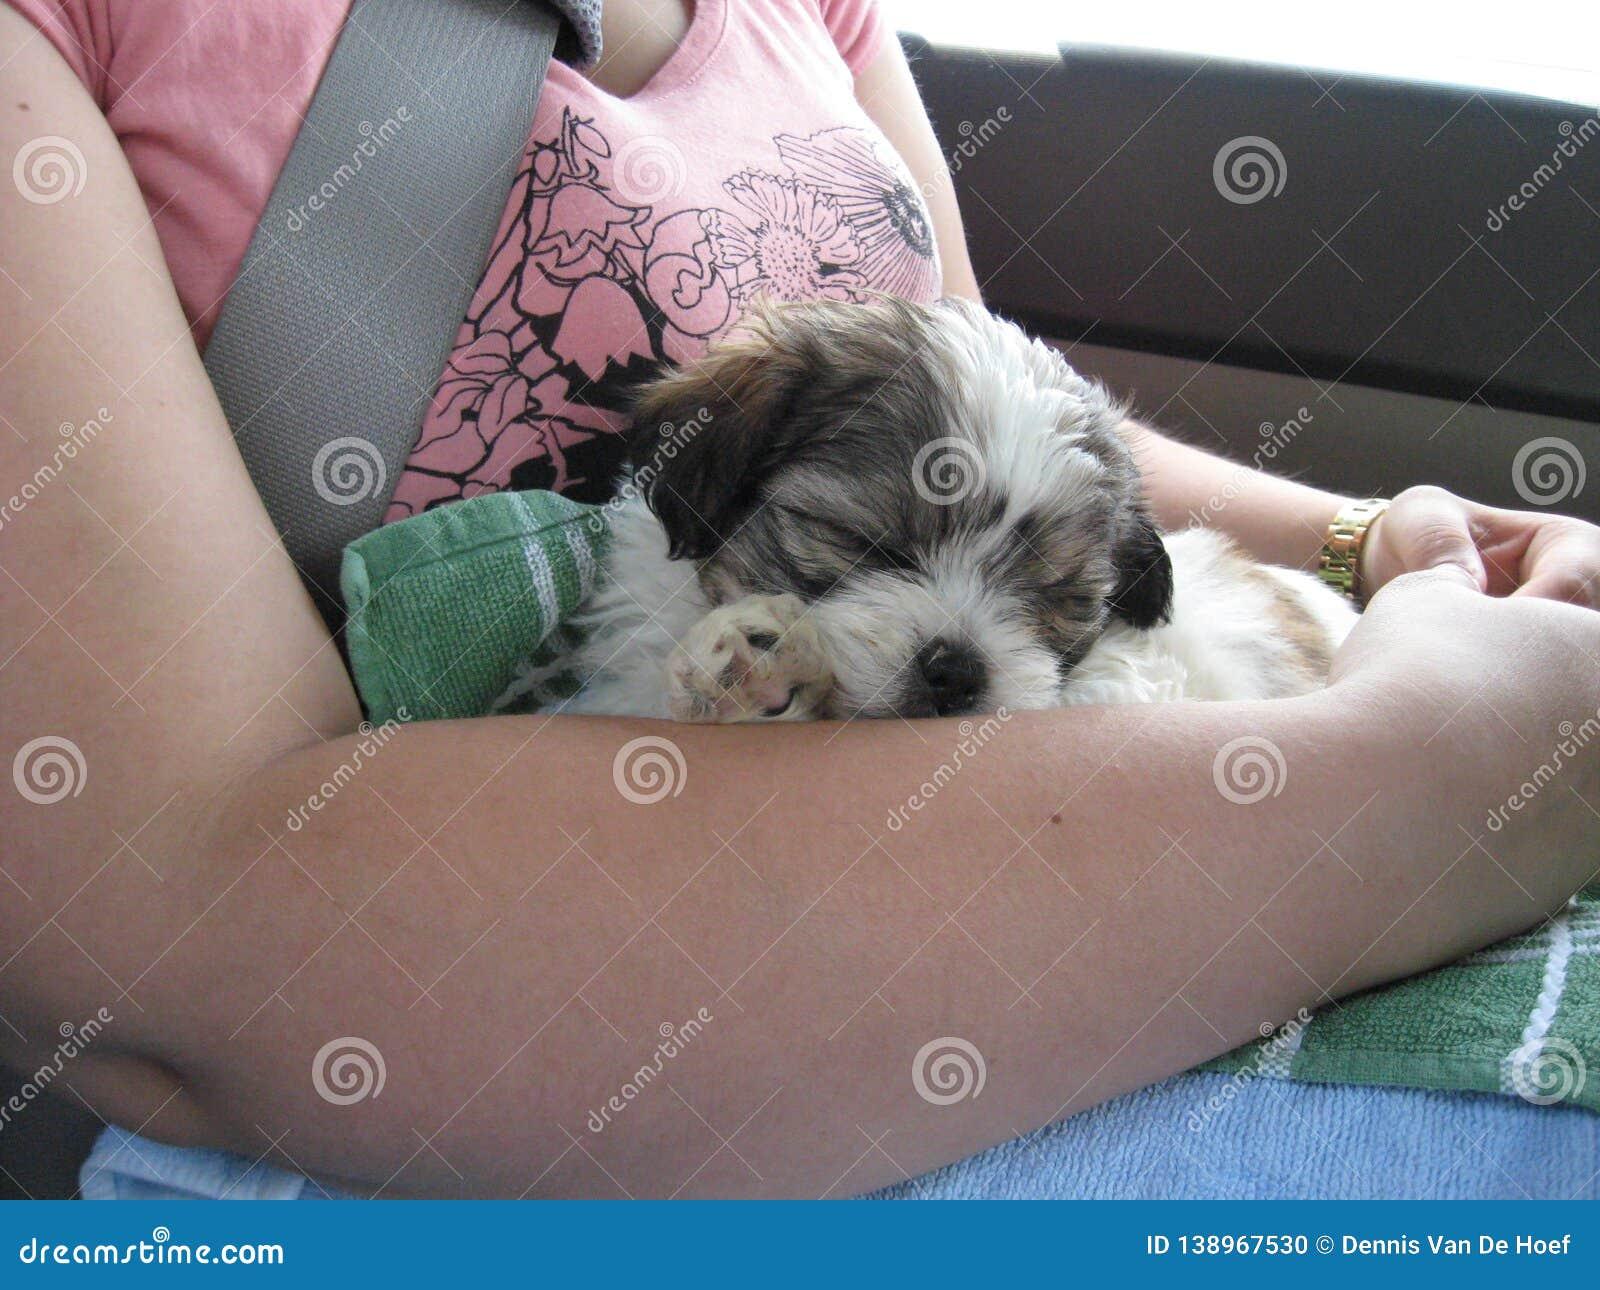 Shih tzu puppy on the way home.